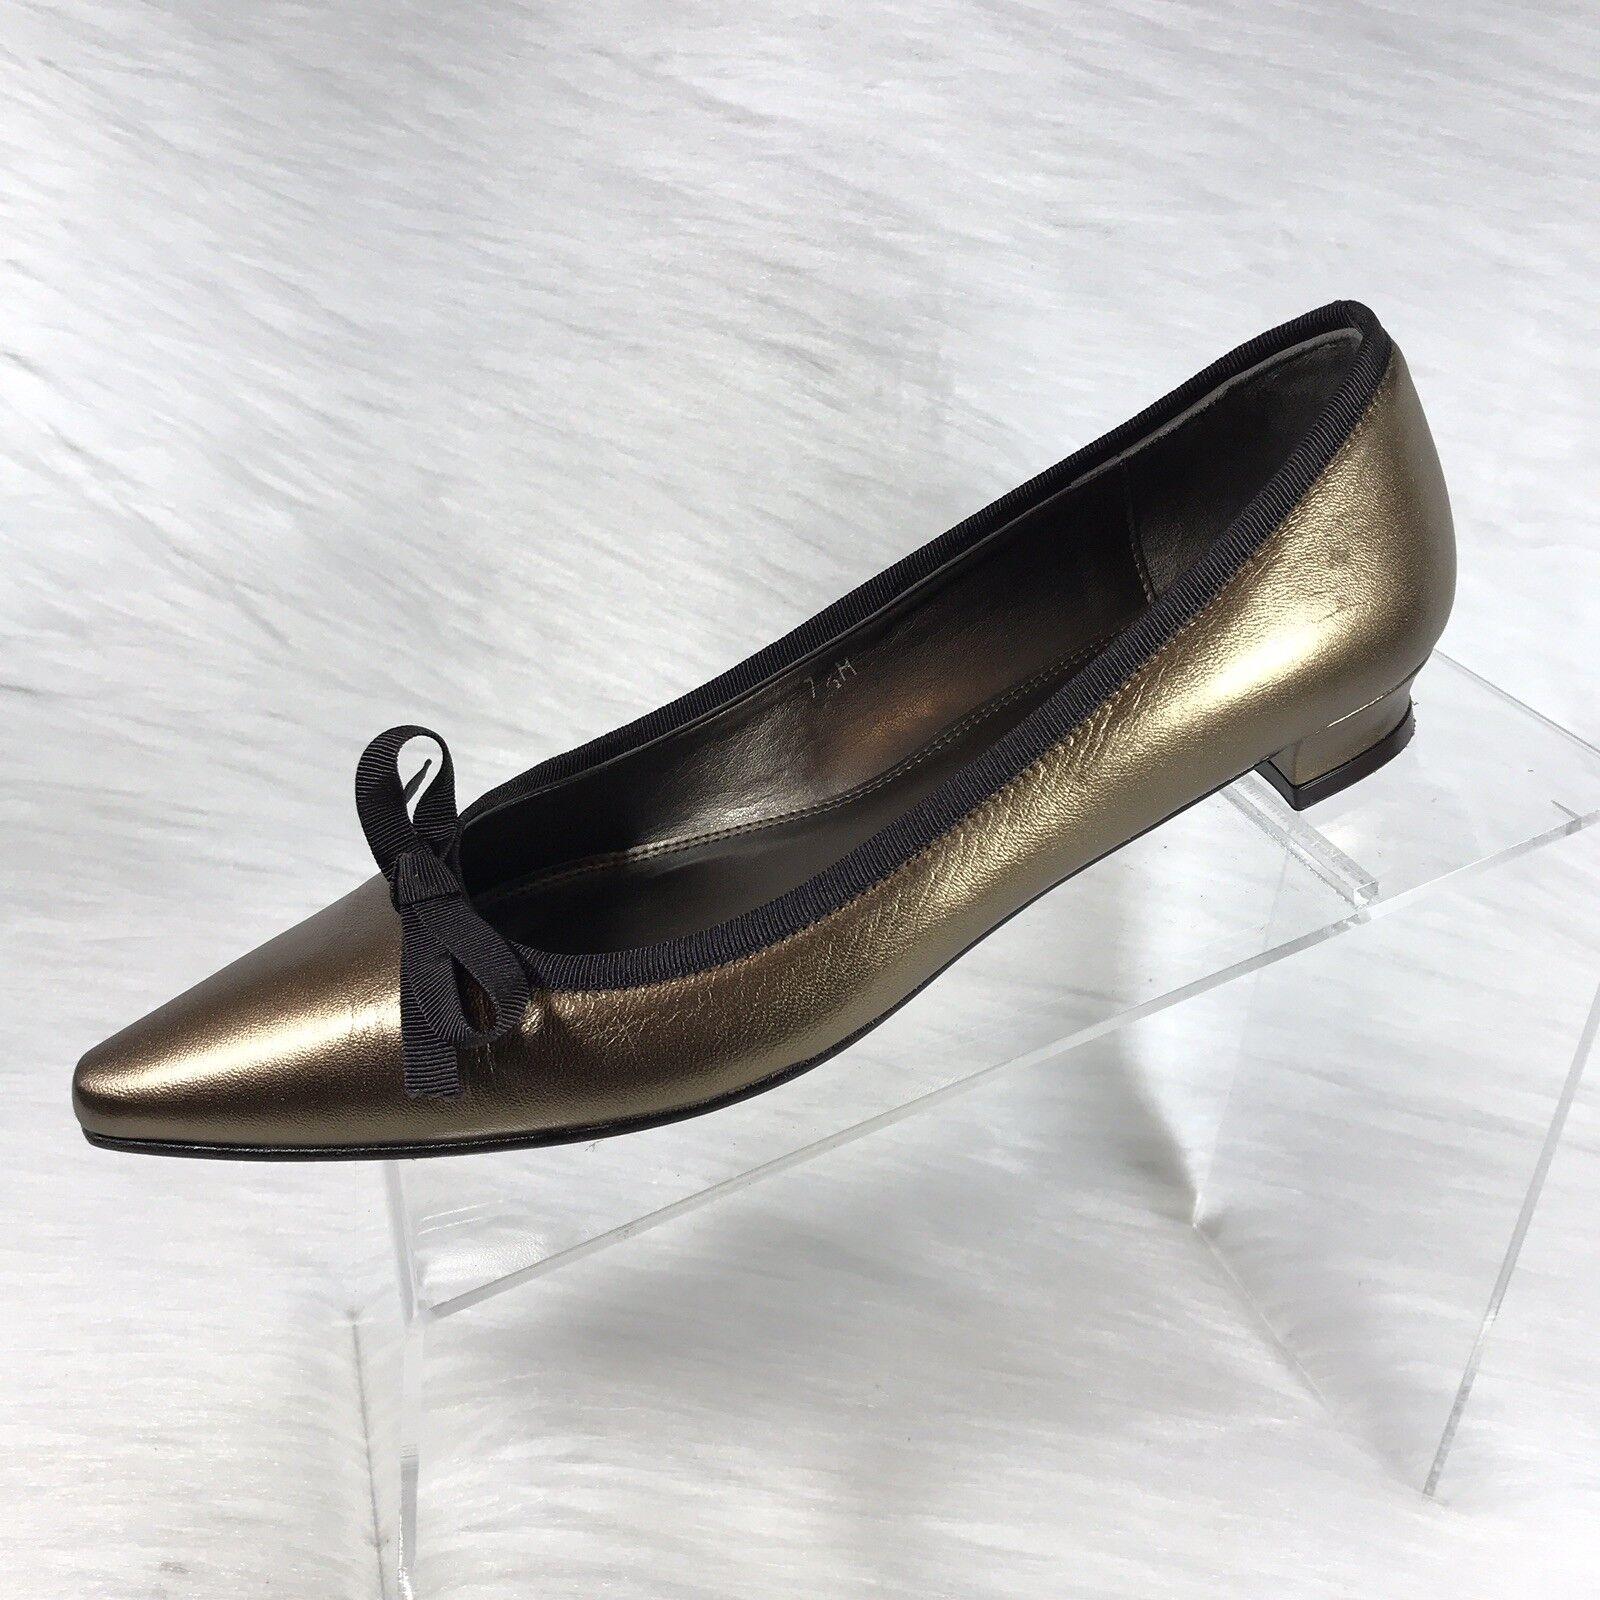 Talbots Women's pumps Bronze Leather Low Heel Size 7.5 M